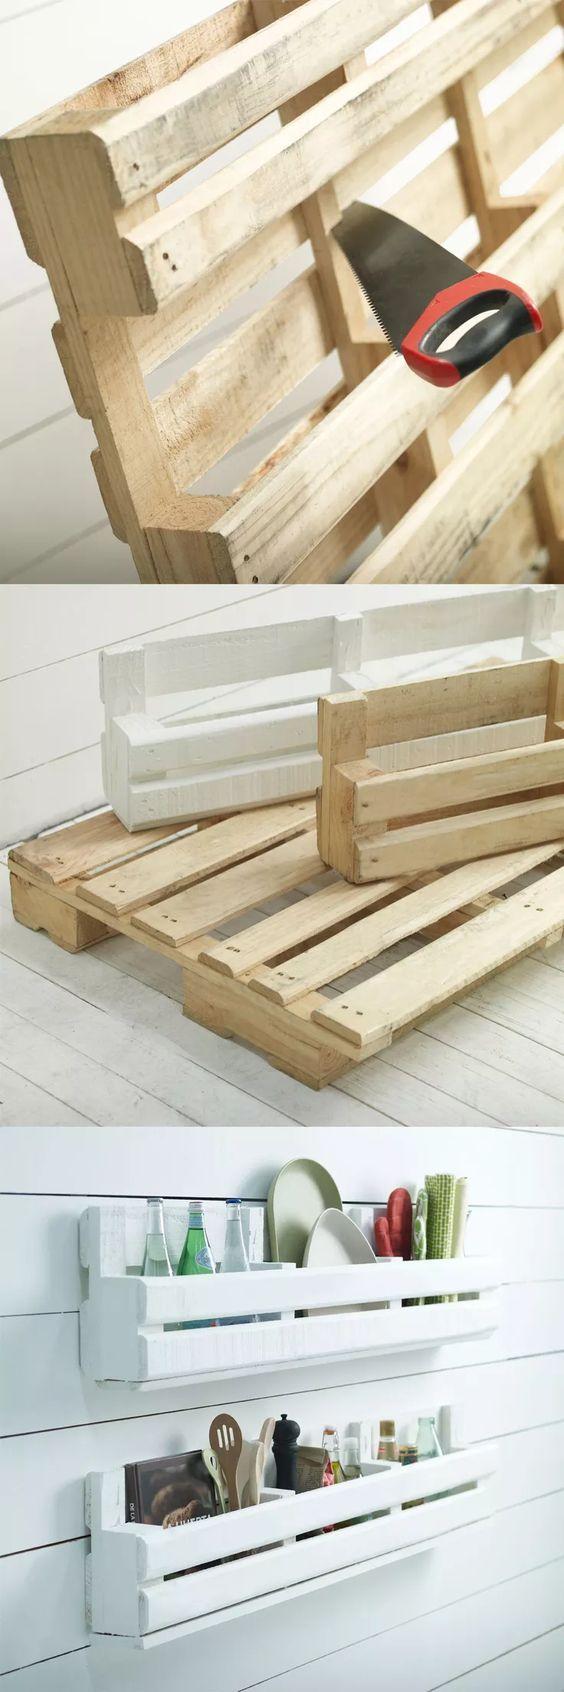 DIY HOME RENOVATING IDEAS BY RESHAPING PALLETS IDEAS #palettendeko